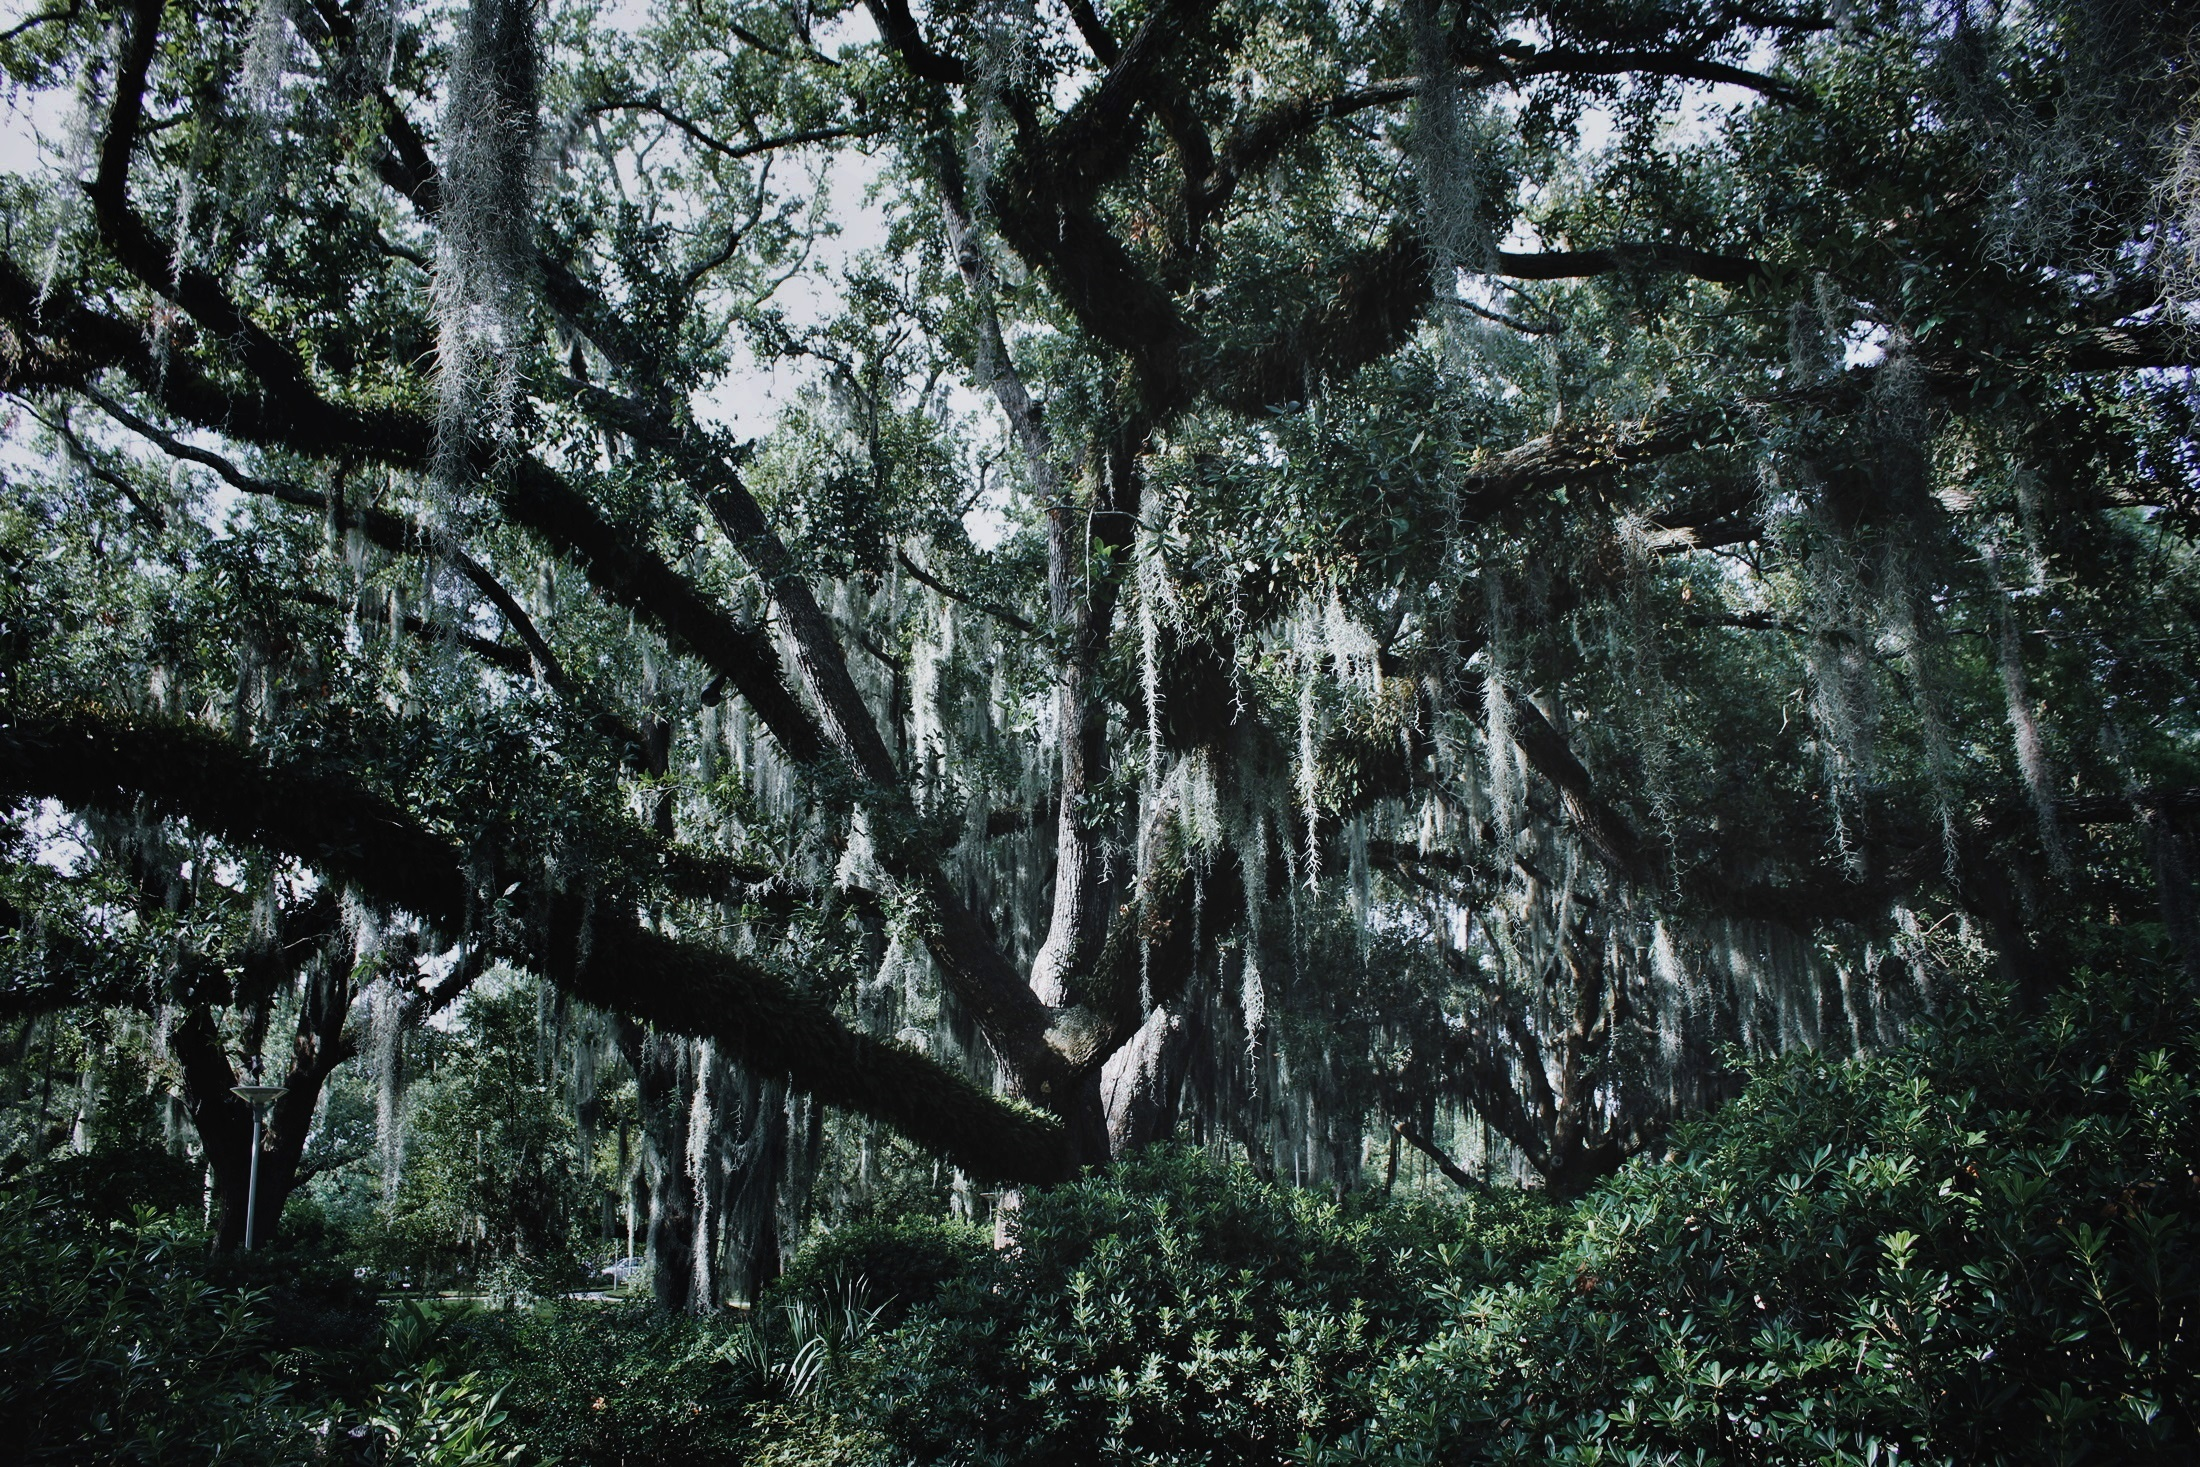 Oak Wizard at City Park, New Orleans, LA  - © Laura Deberle